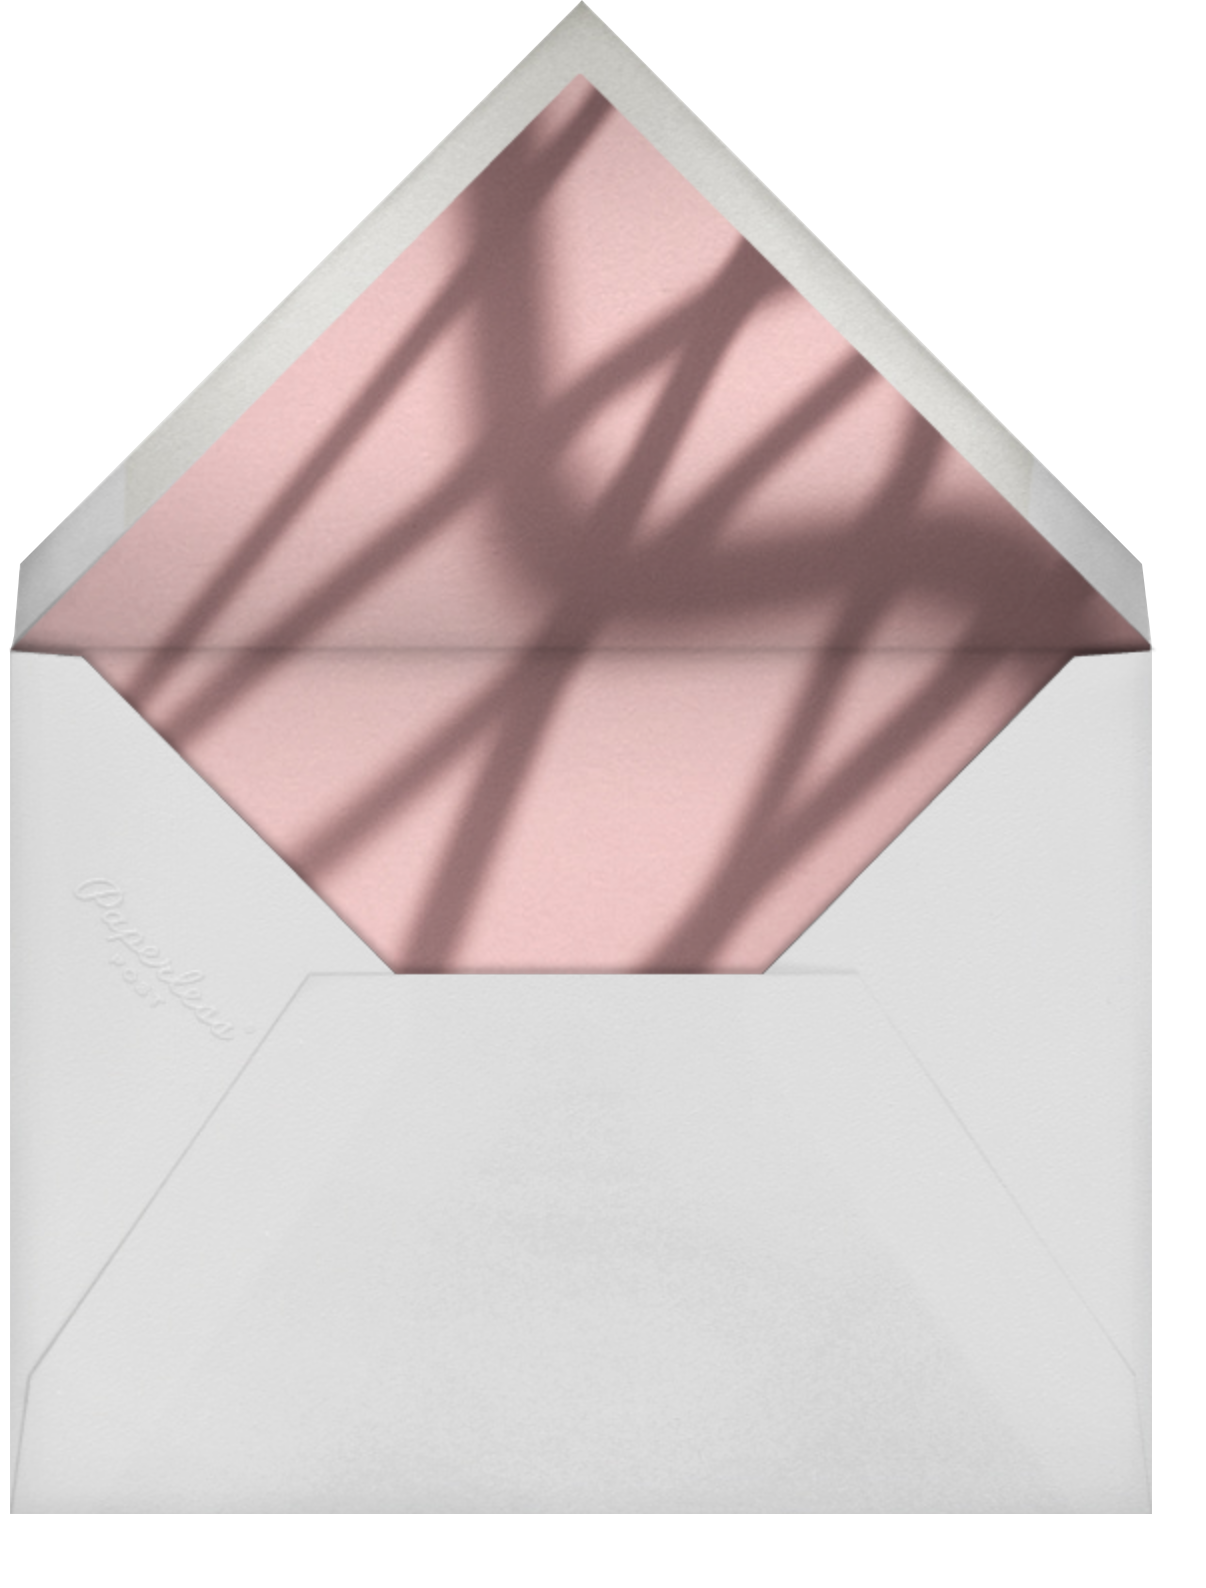 Markham Photo - Gold - Paperless Post - Envelope